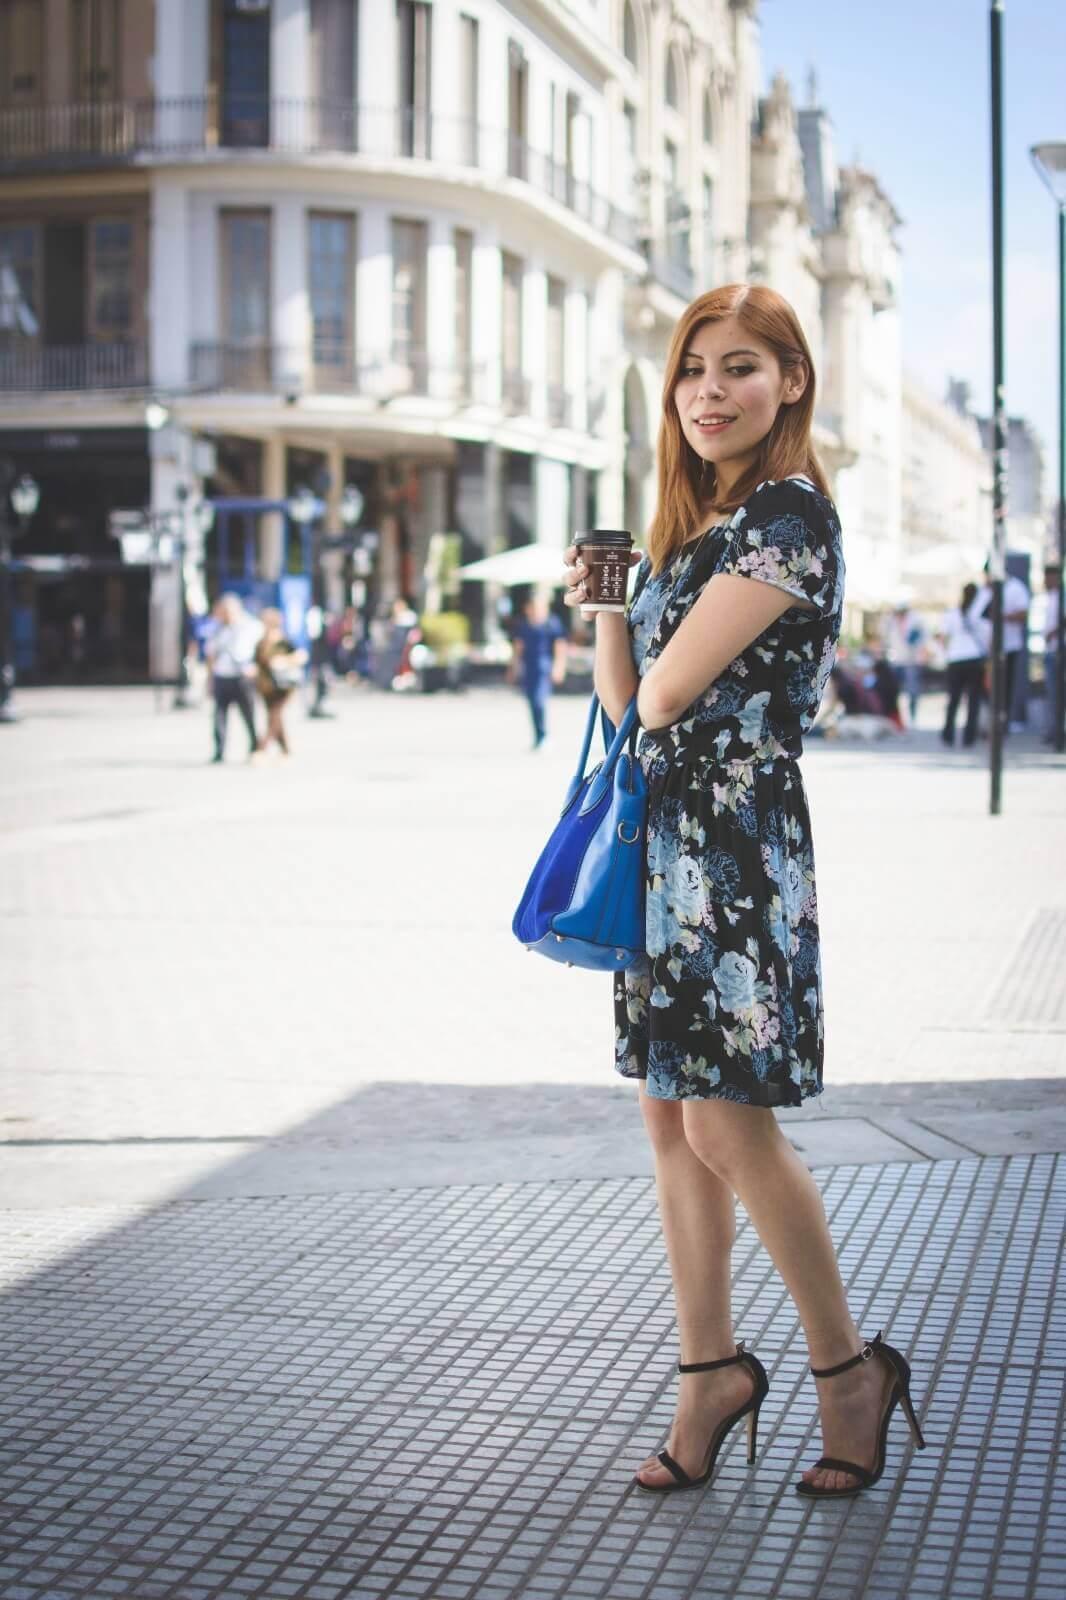 gamiss-black-strappy-sandals-blue-floral-dress-rosegal-cobalt-blue-tote-bag-deborah-ferrero-style-by-deb12